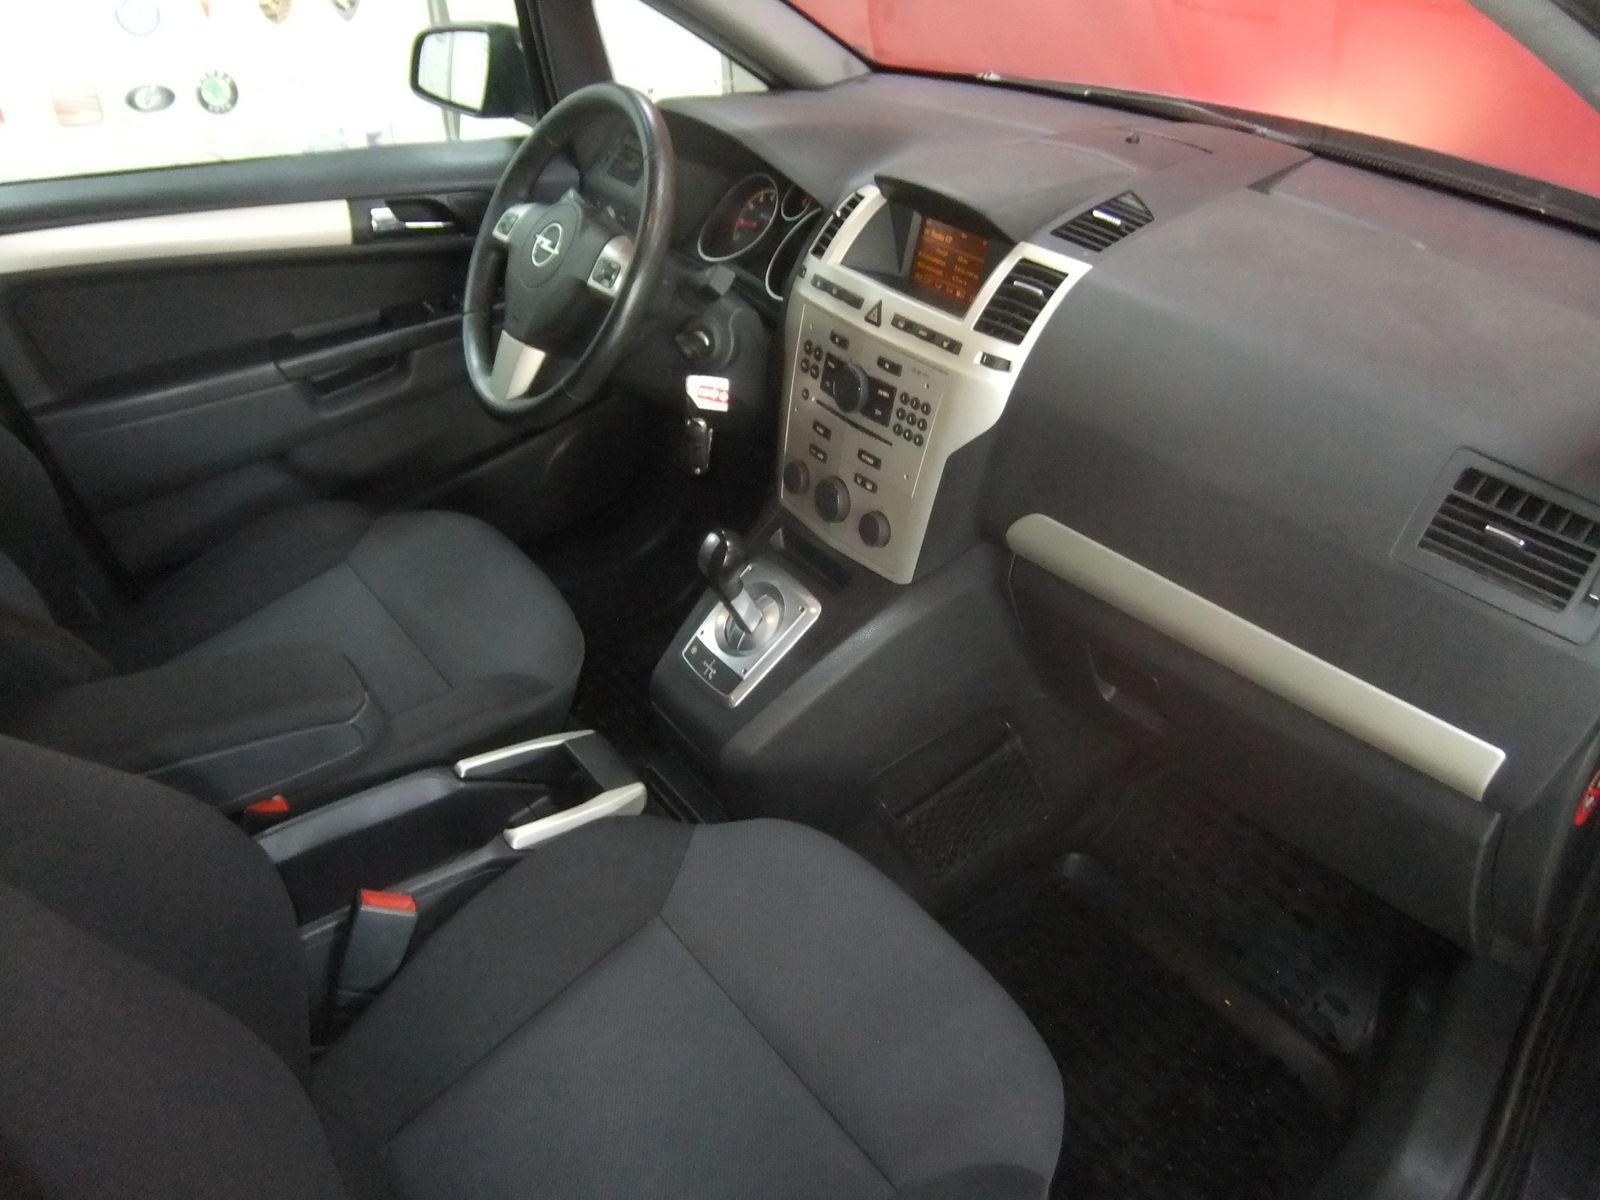 Opel Zafira, B 2008г.